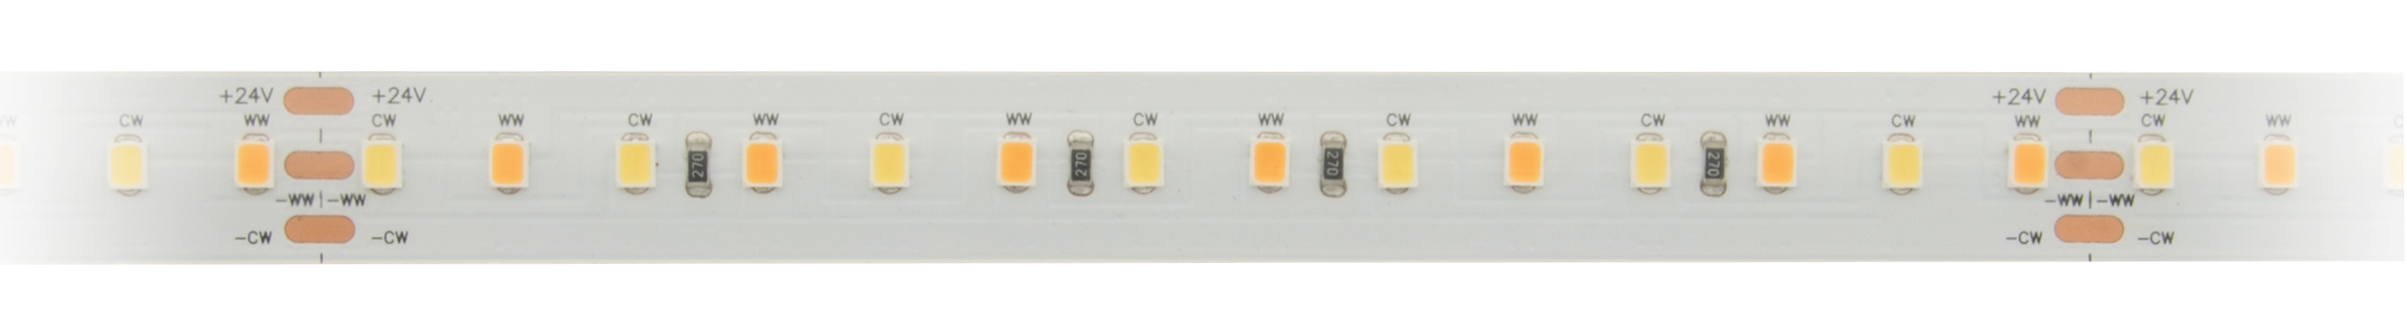 1 Stk Flexstrip 115 DW  100% Mix 26,3 W/m 2108lm/m 24VDC IP44 l=5m LIFS009104